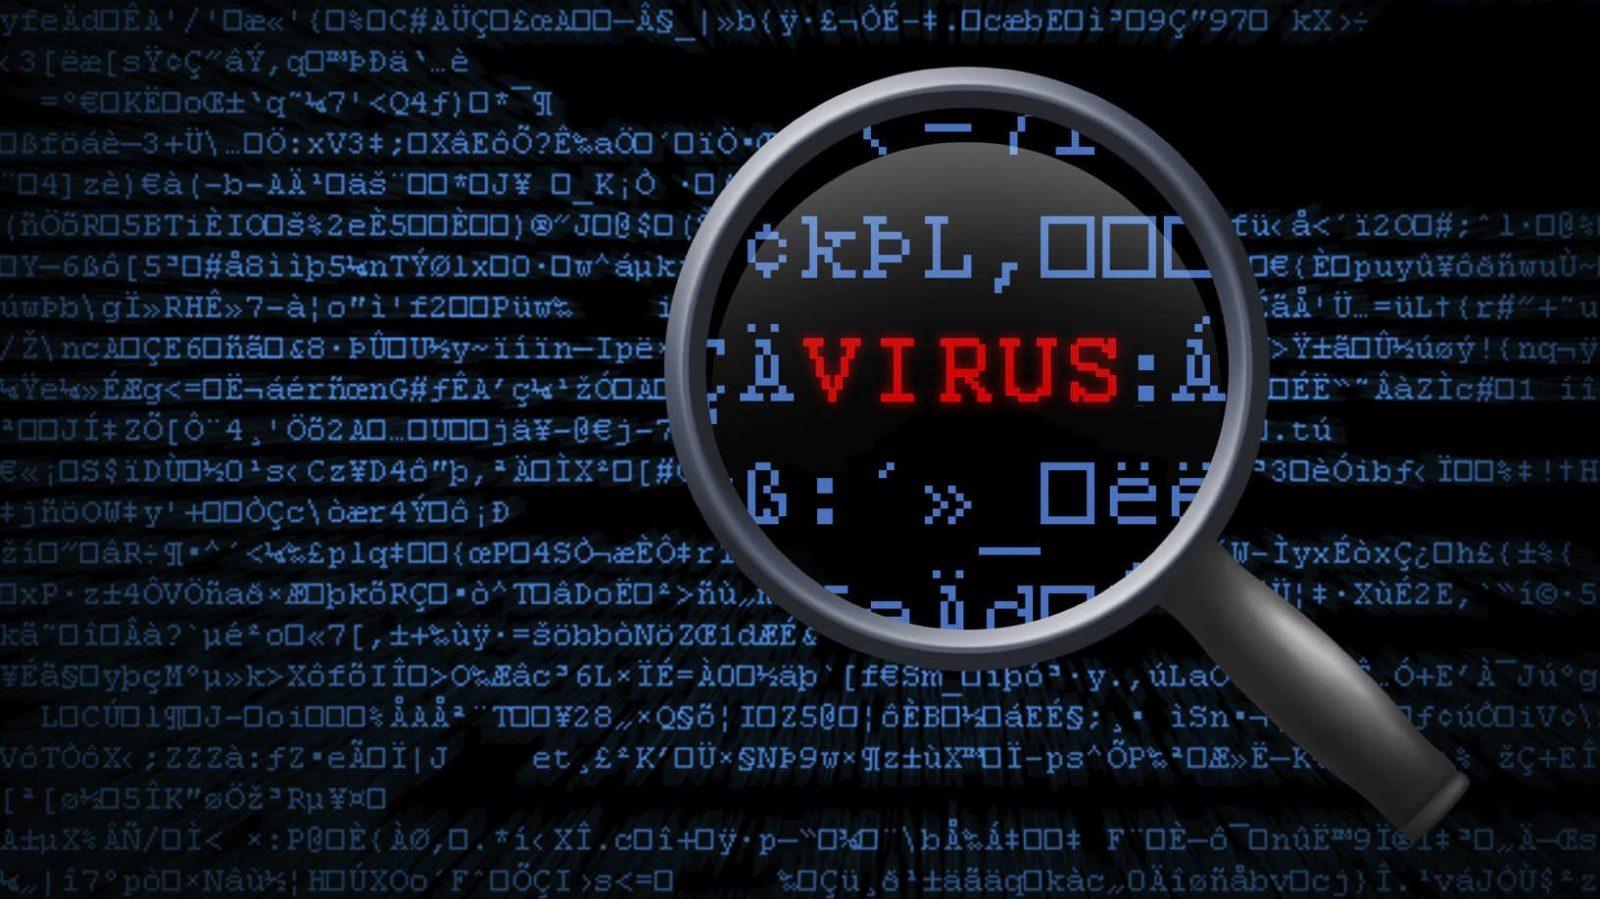 Вирус на коспьютере